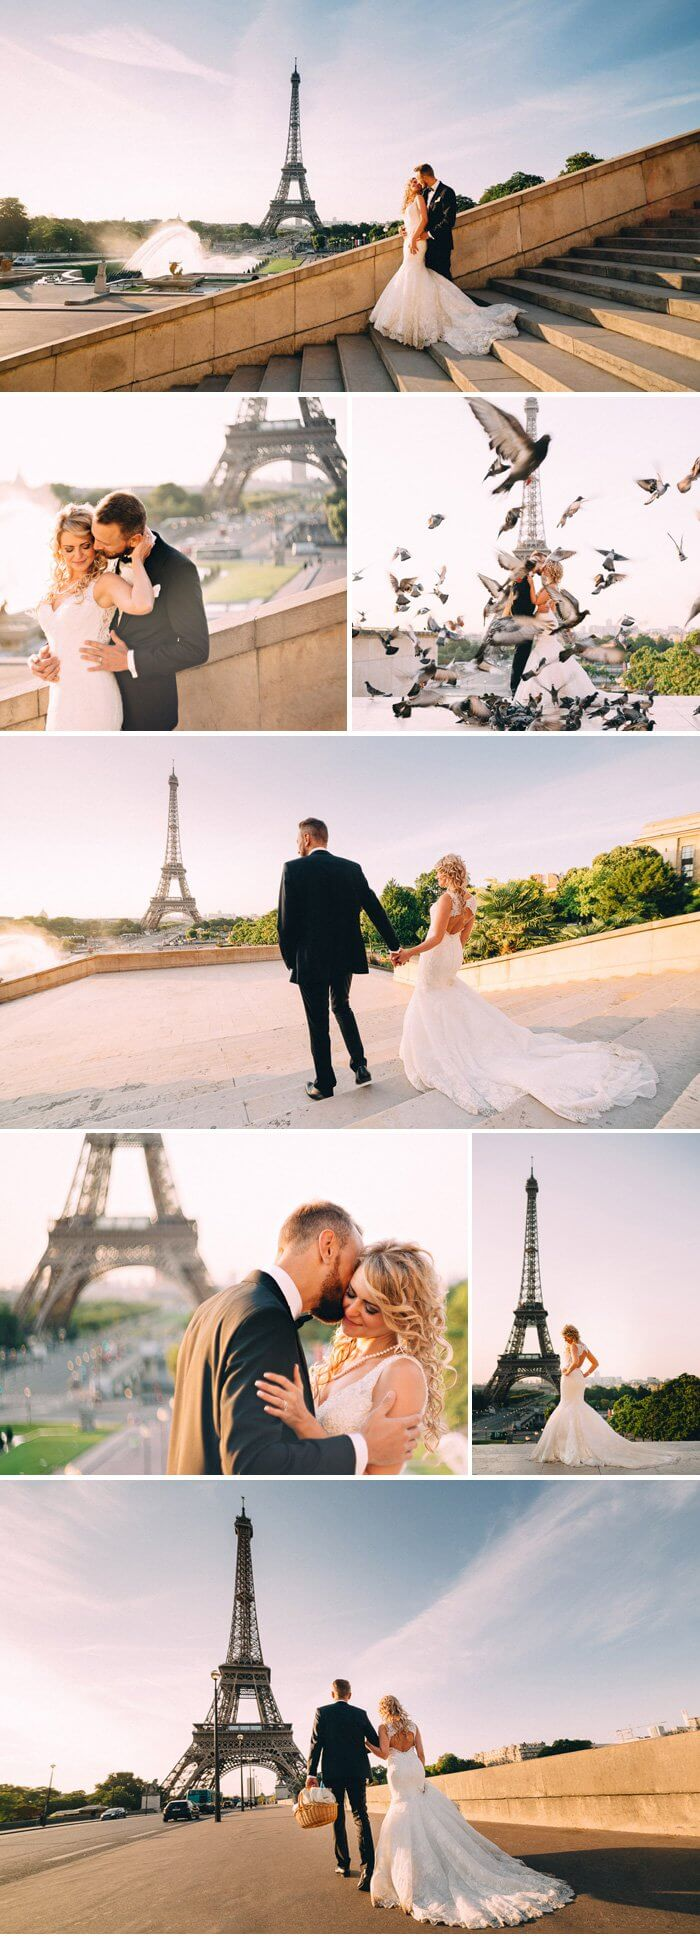 After Wedding Shooting in Paris